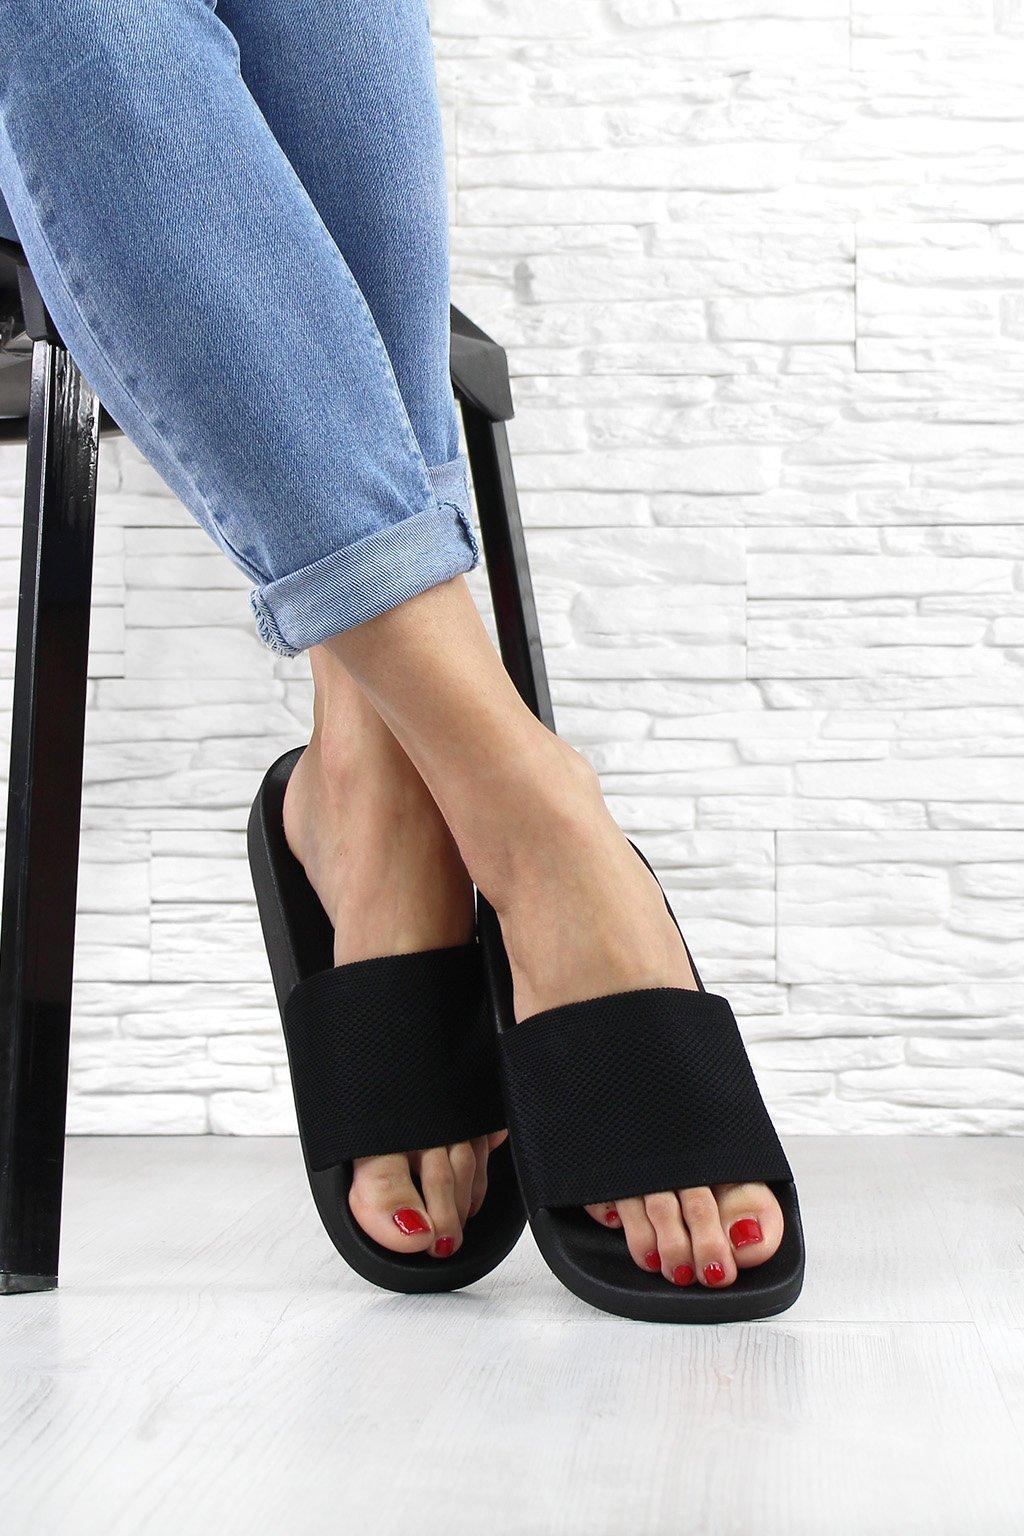 Gumové pantofle 232 5B (1)